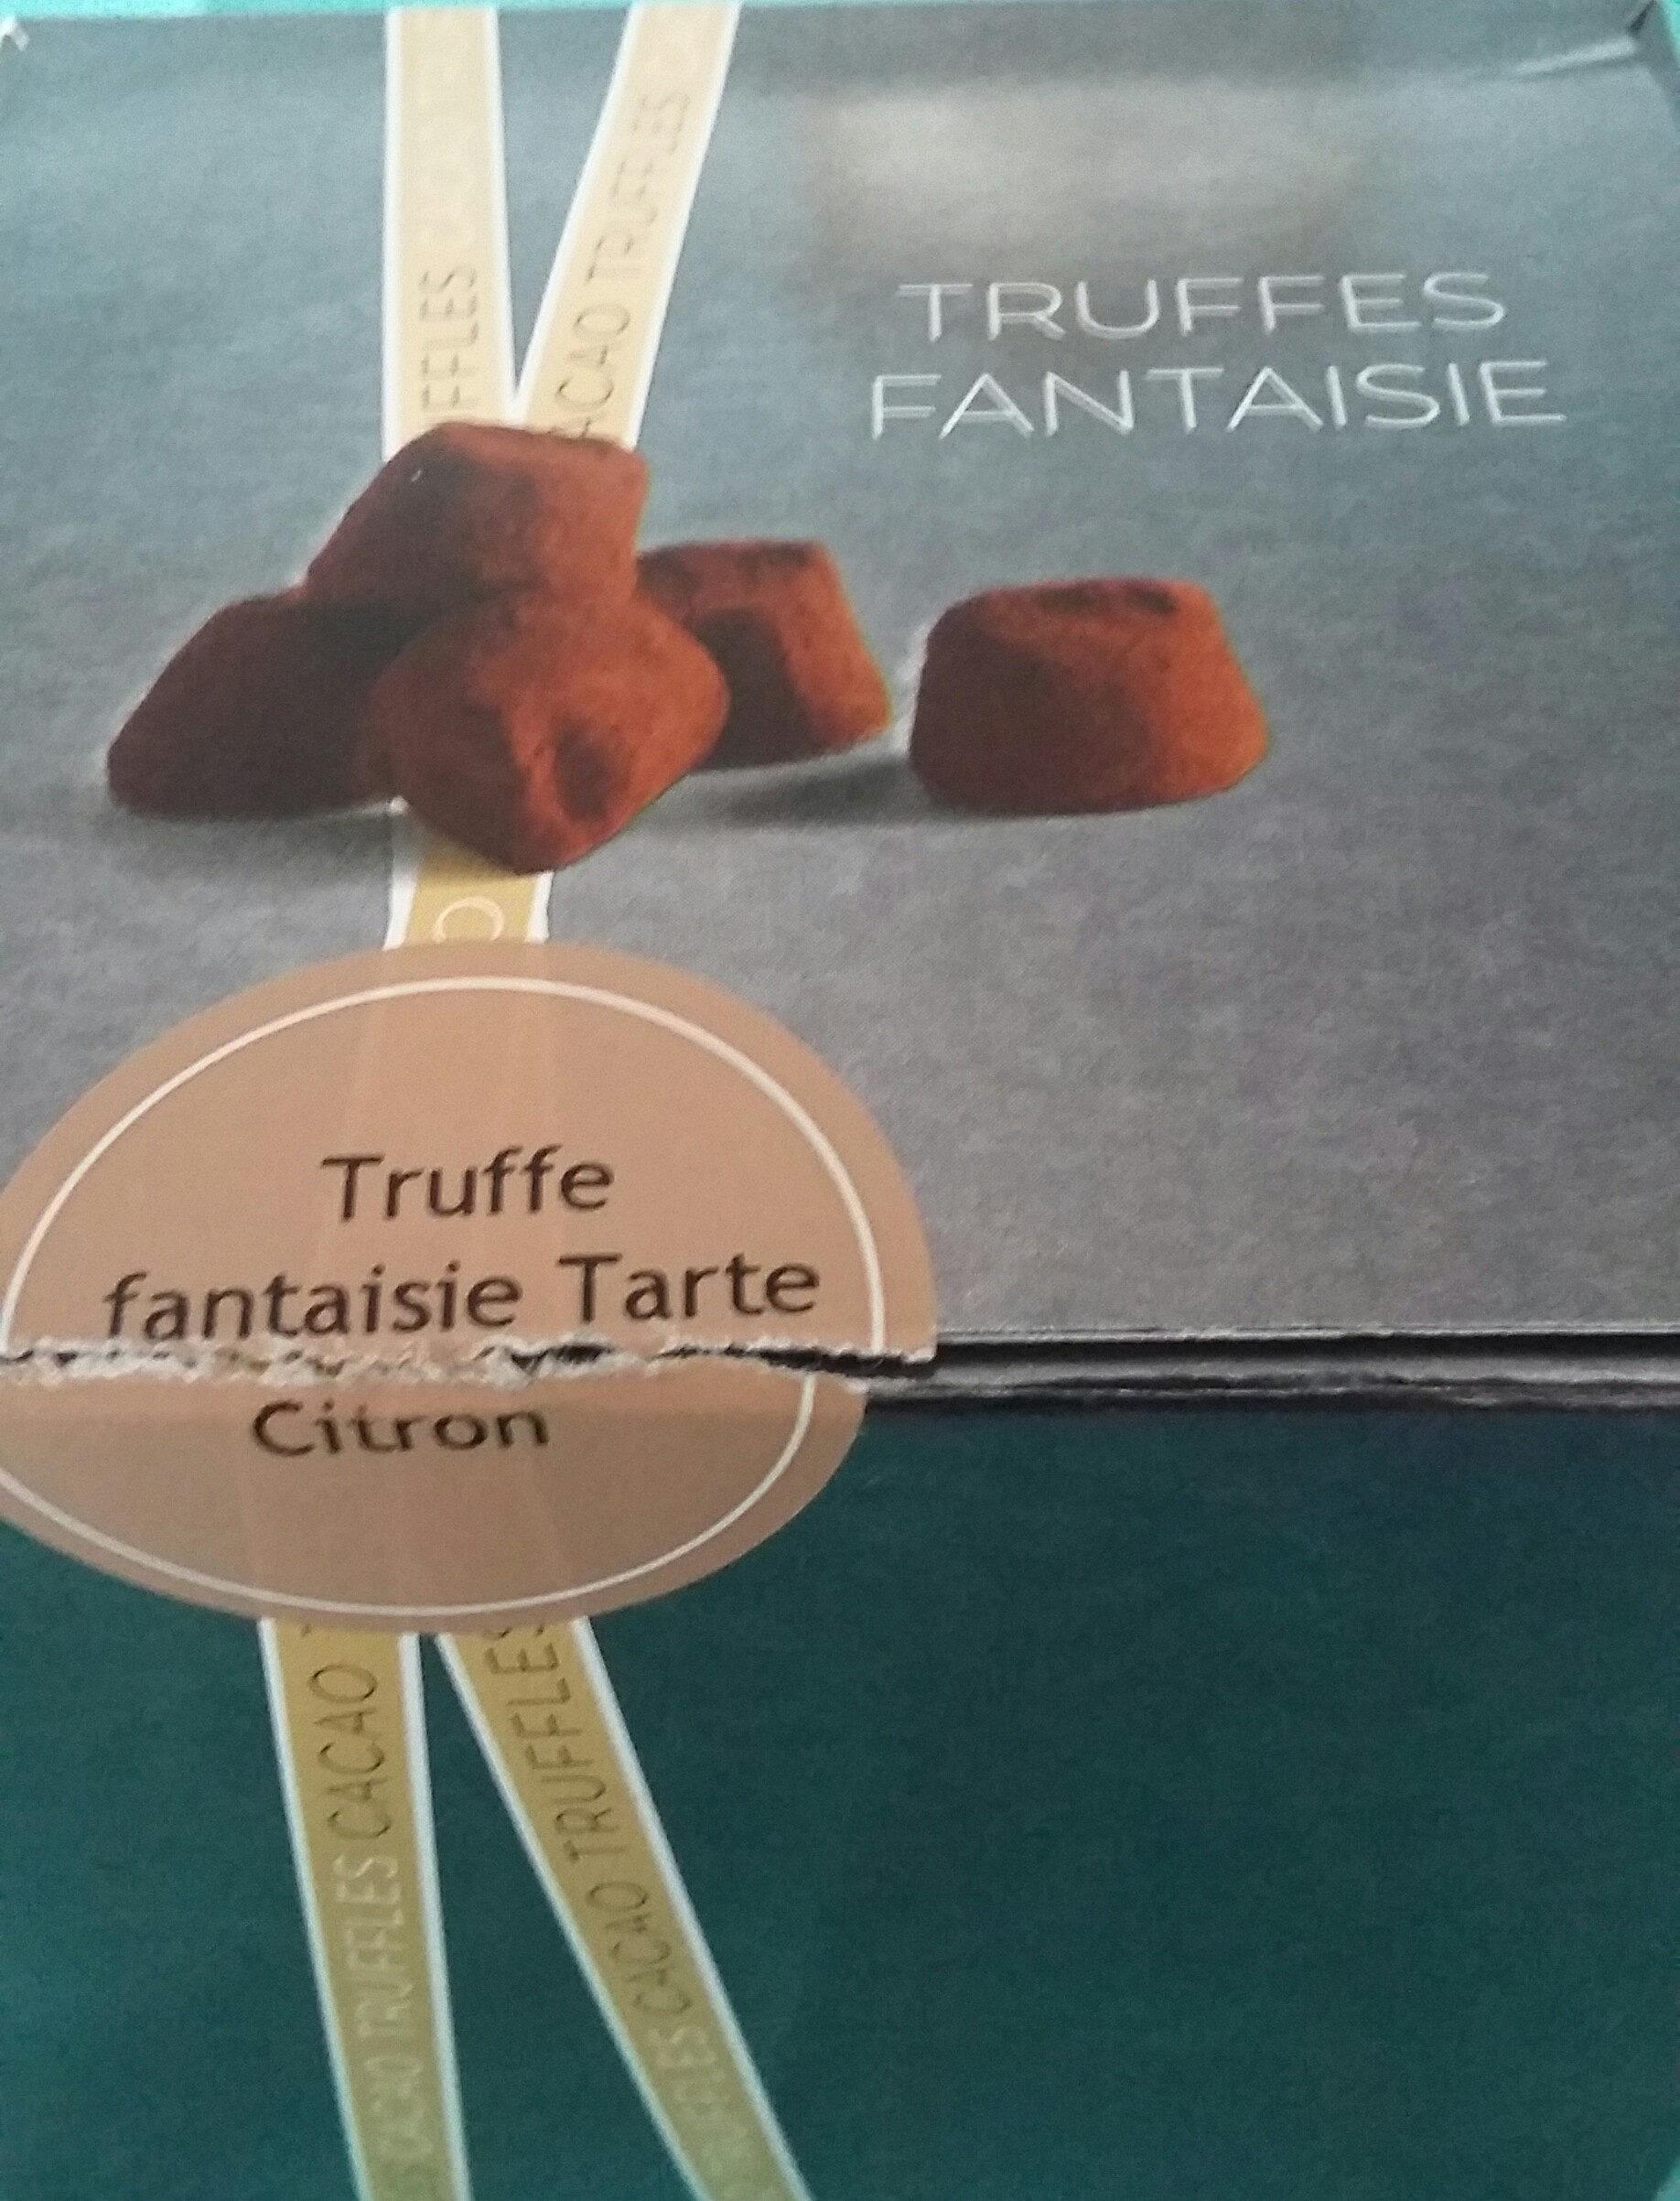 Truffe fantaisie tarte citron - Product